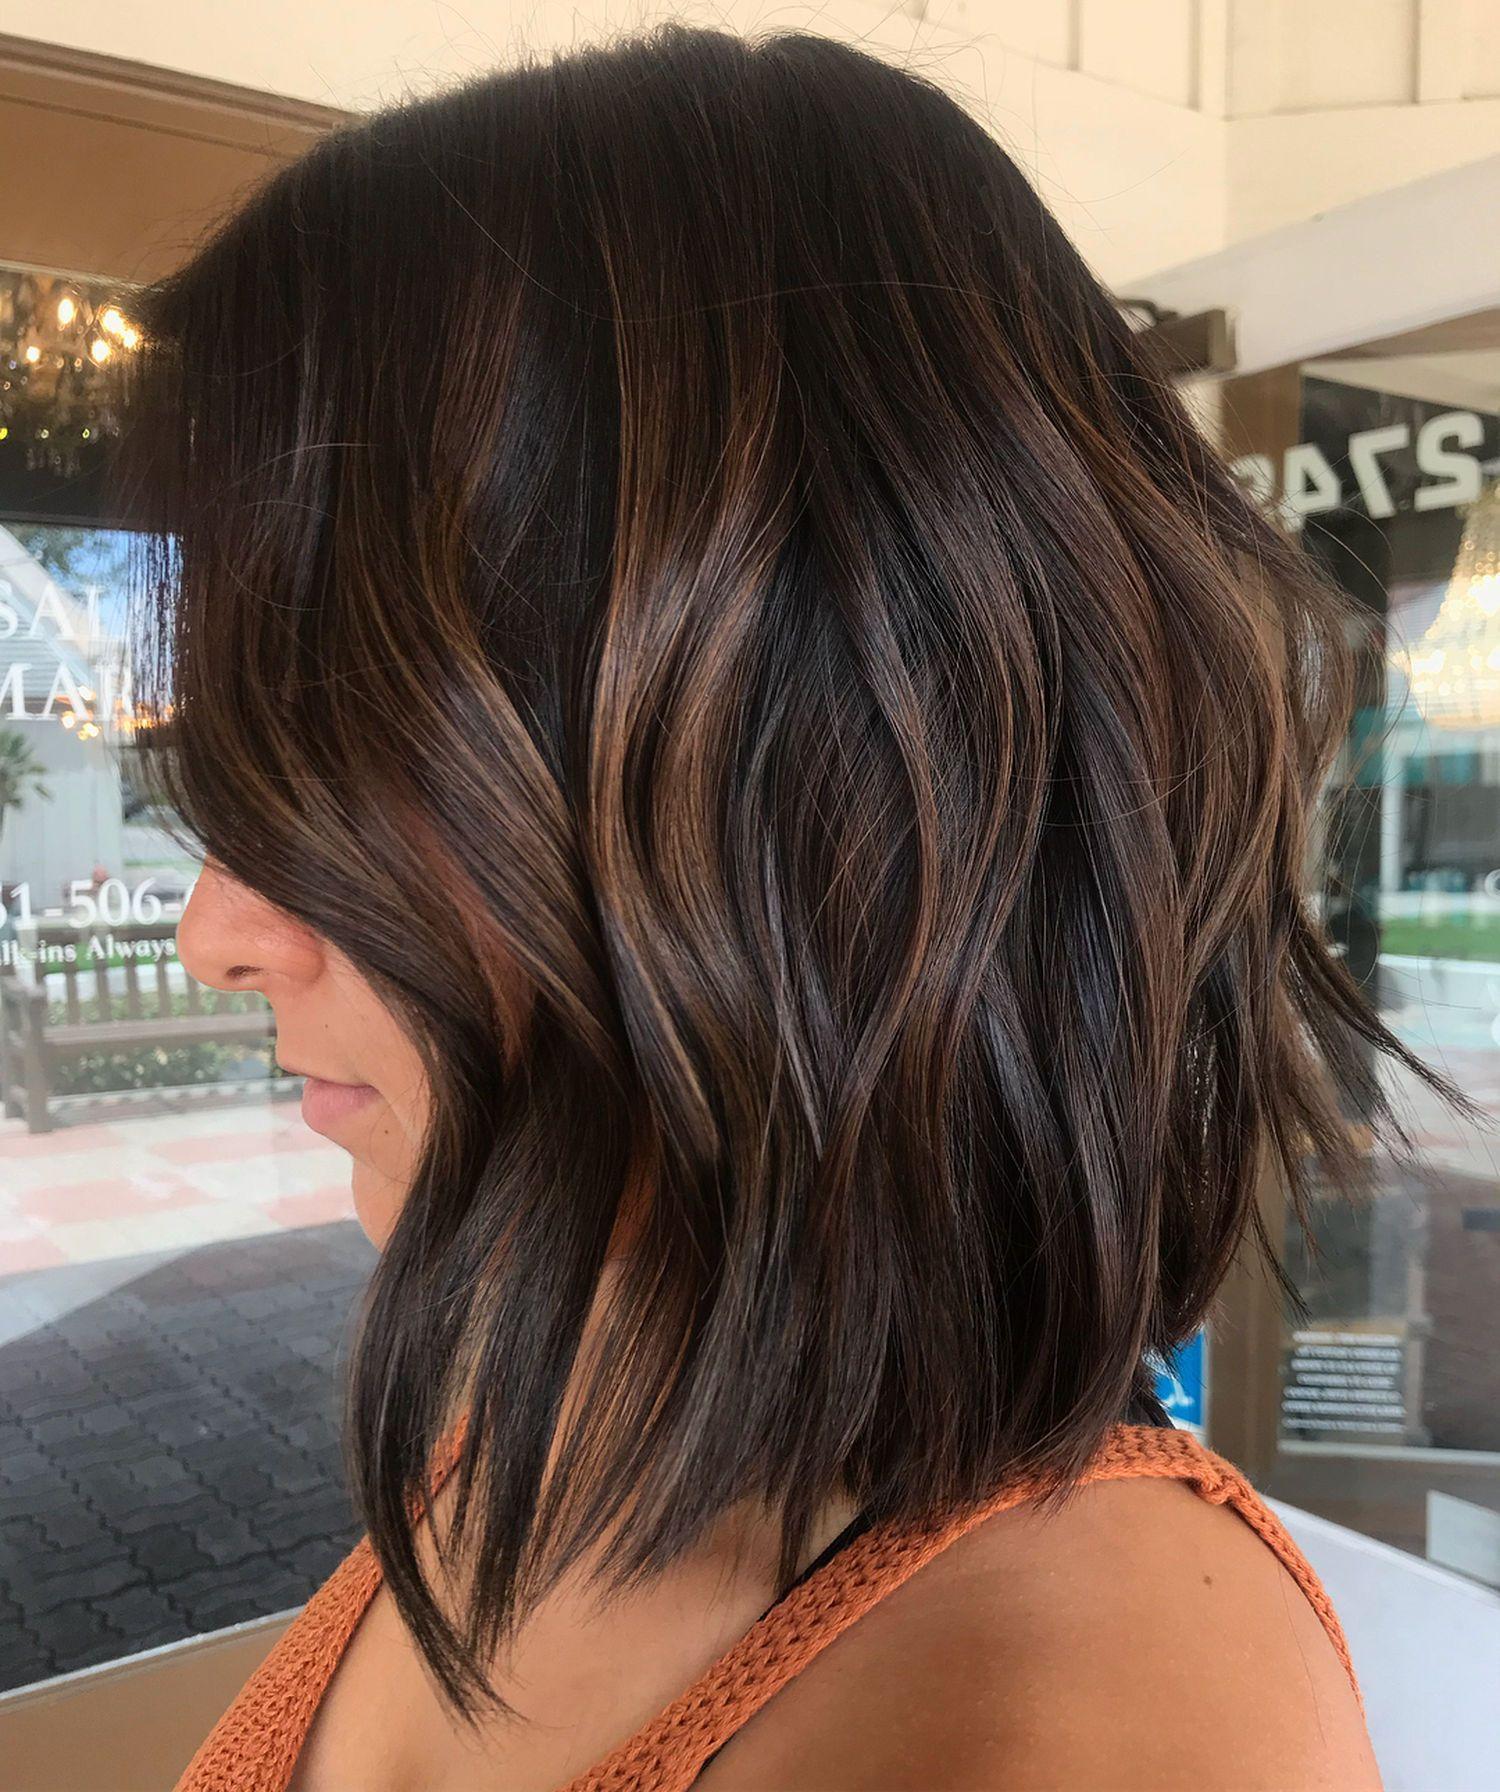 19 Subtle And Soft Highlights Short Hair Balayage Hair Styles Hair Highlights